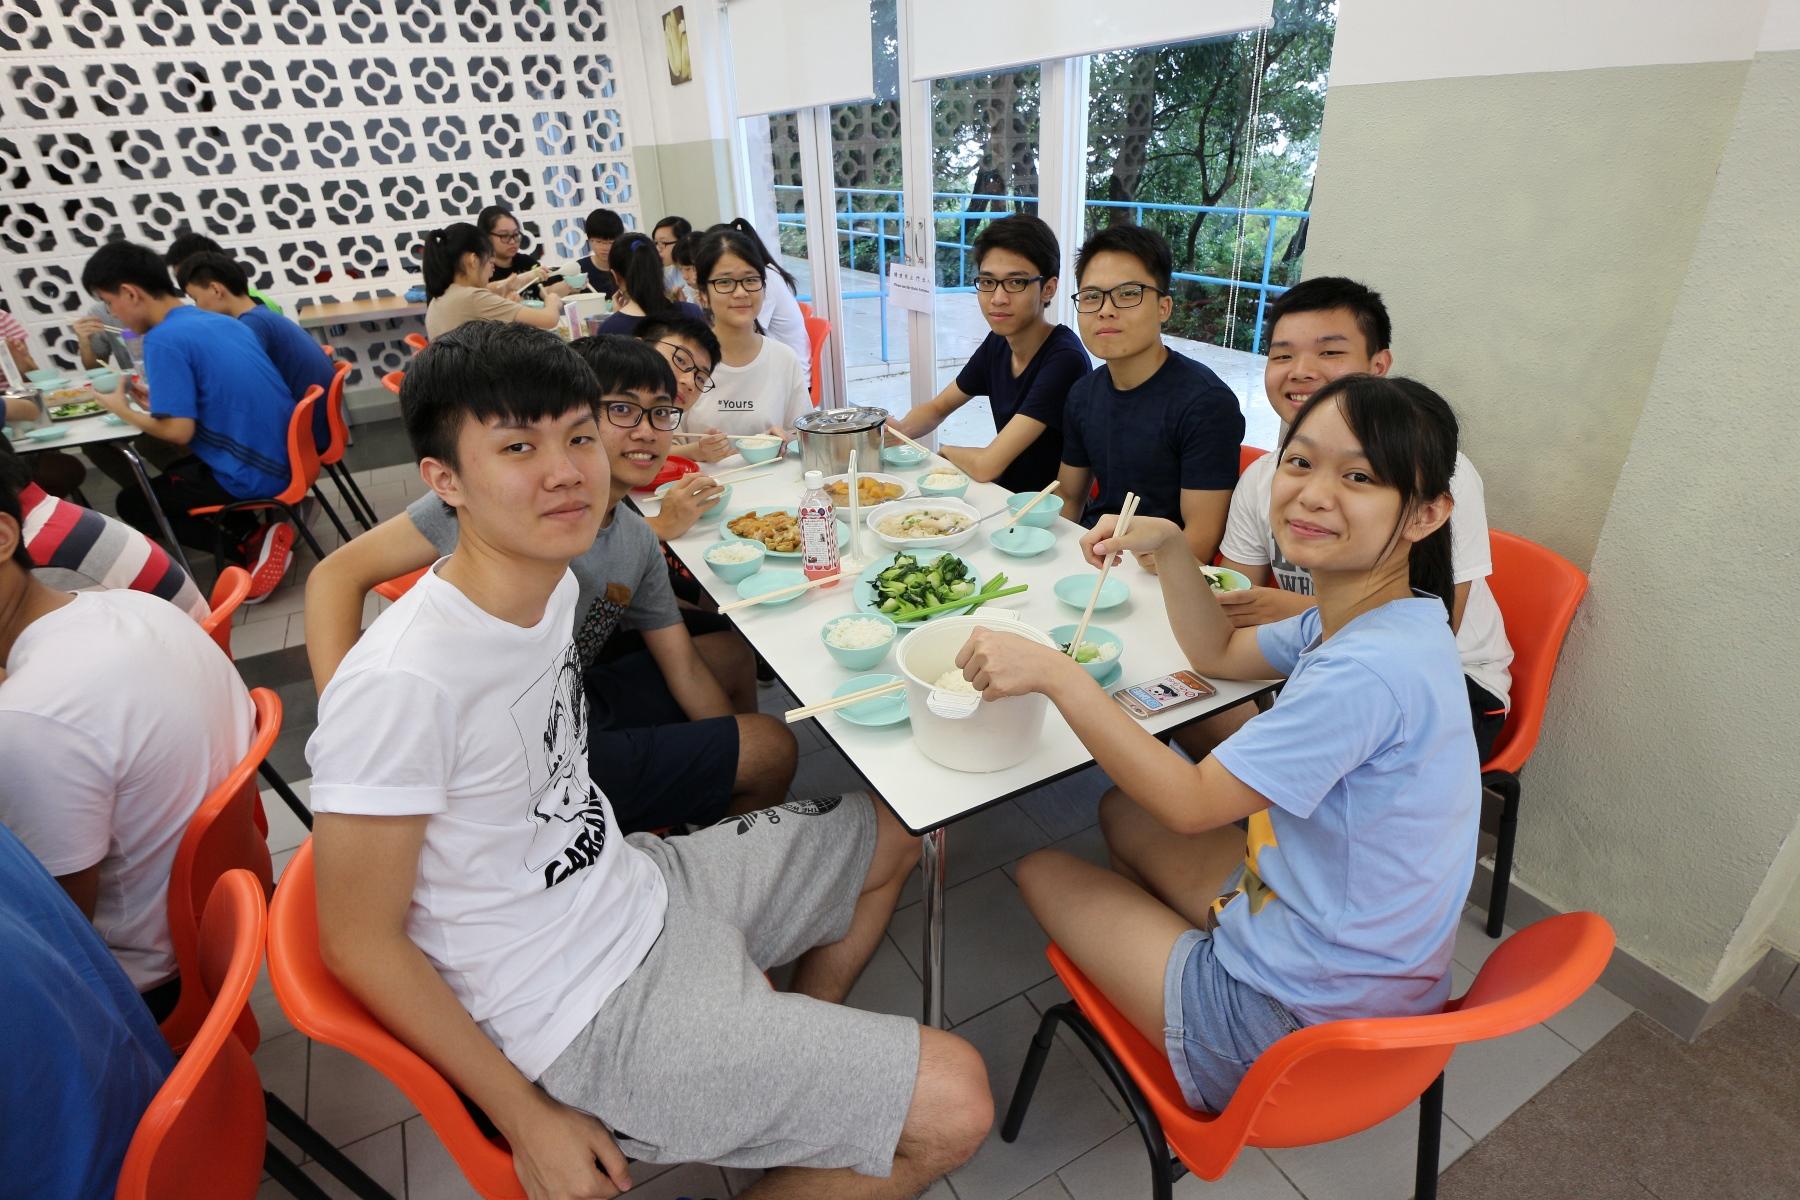 http://www.npc.edu.hk/sites/default/files/img_0580.jpg